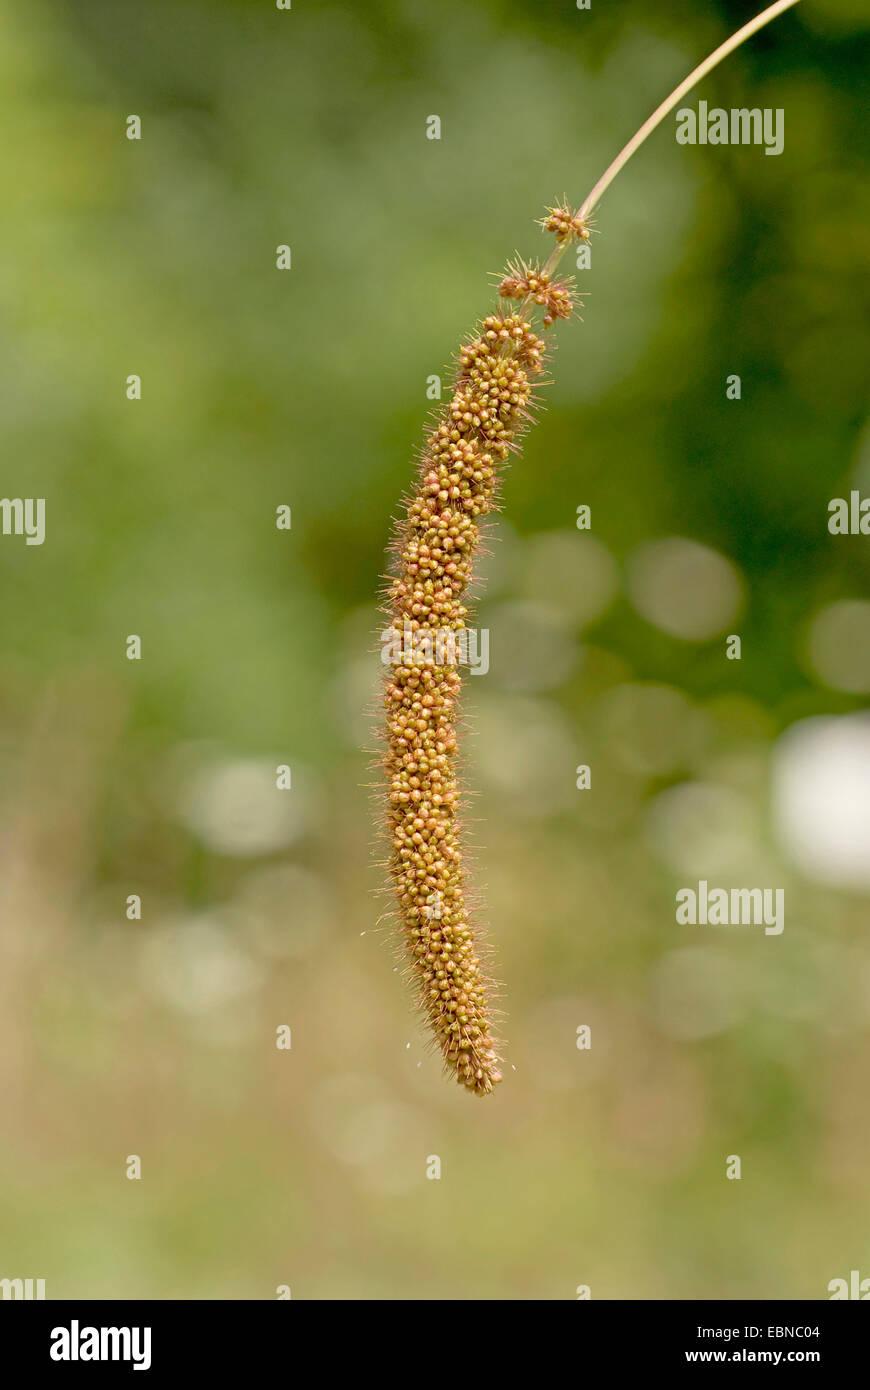 Le millet, millet Italien, Allemand, Chinois, MIL MIL MIL Hongrois (Setaria italica), panicule Photo Stock